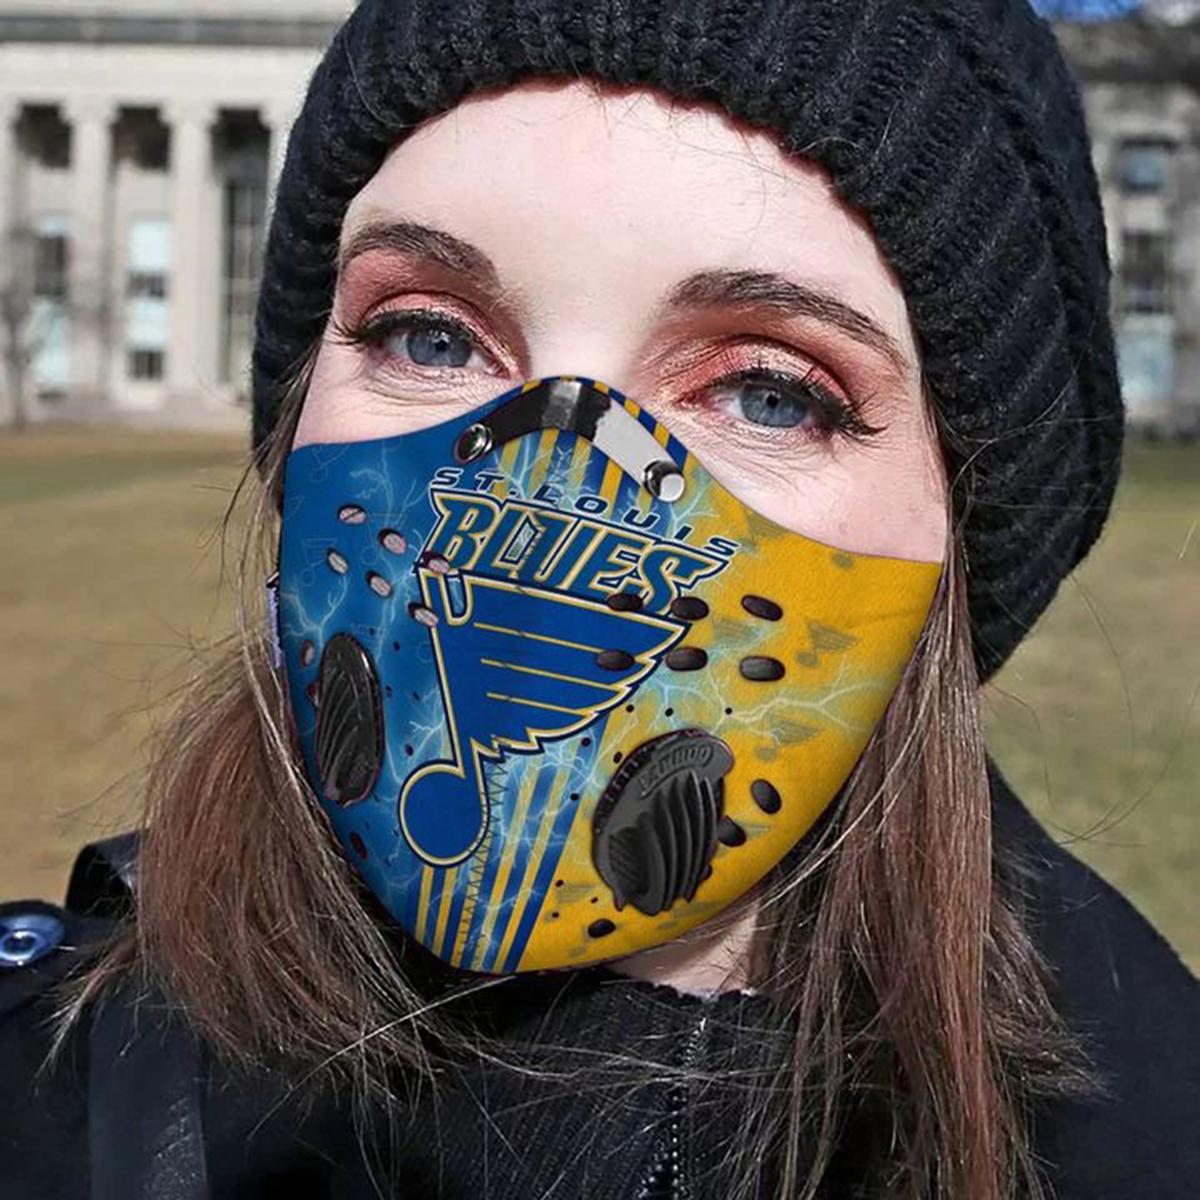 St louis blues filter face mask - Picture 1